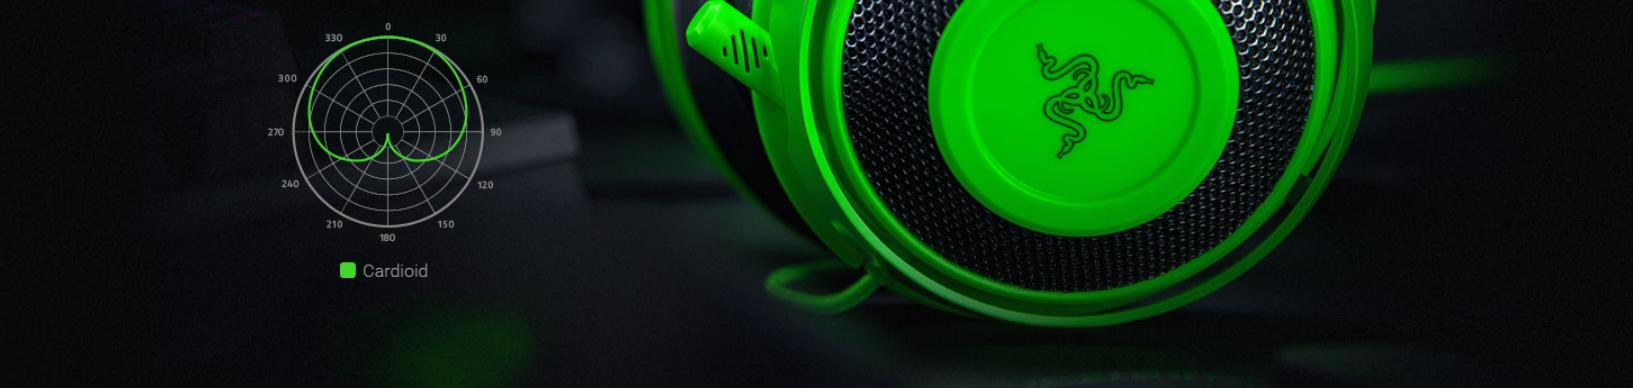 Tai nghe Razer Kraken Multi Platform Wired Gaming Headset Quartz RZ04-02830300-R3M1 trang bị micro khử ồn tốt